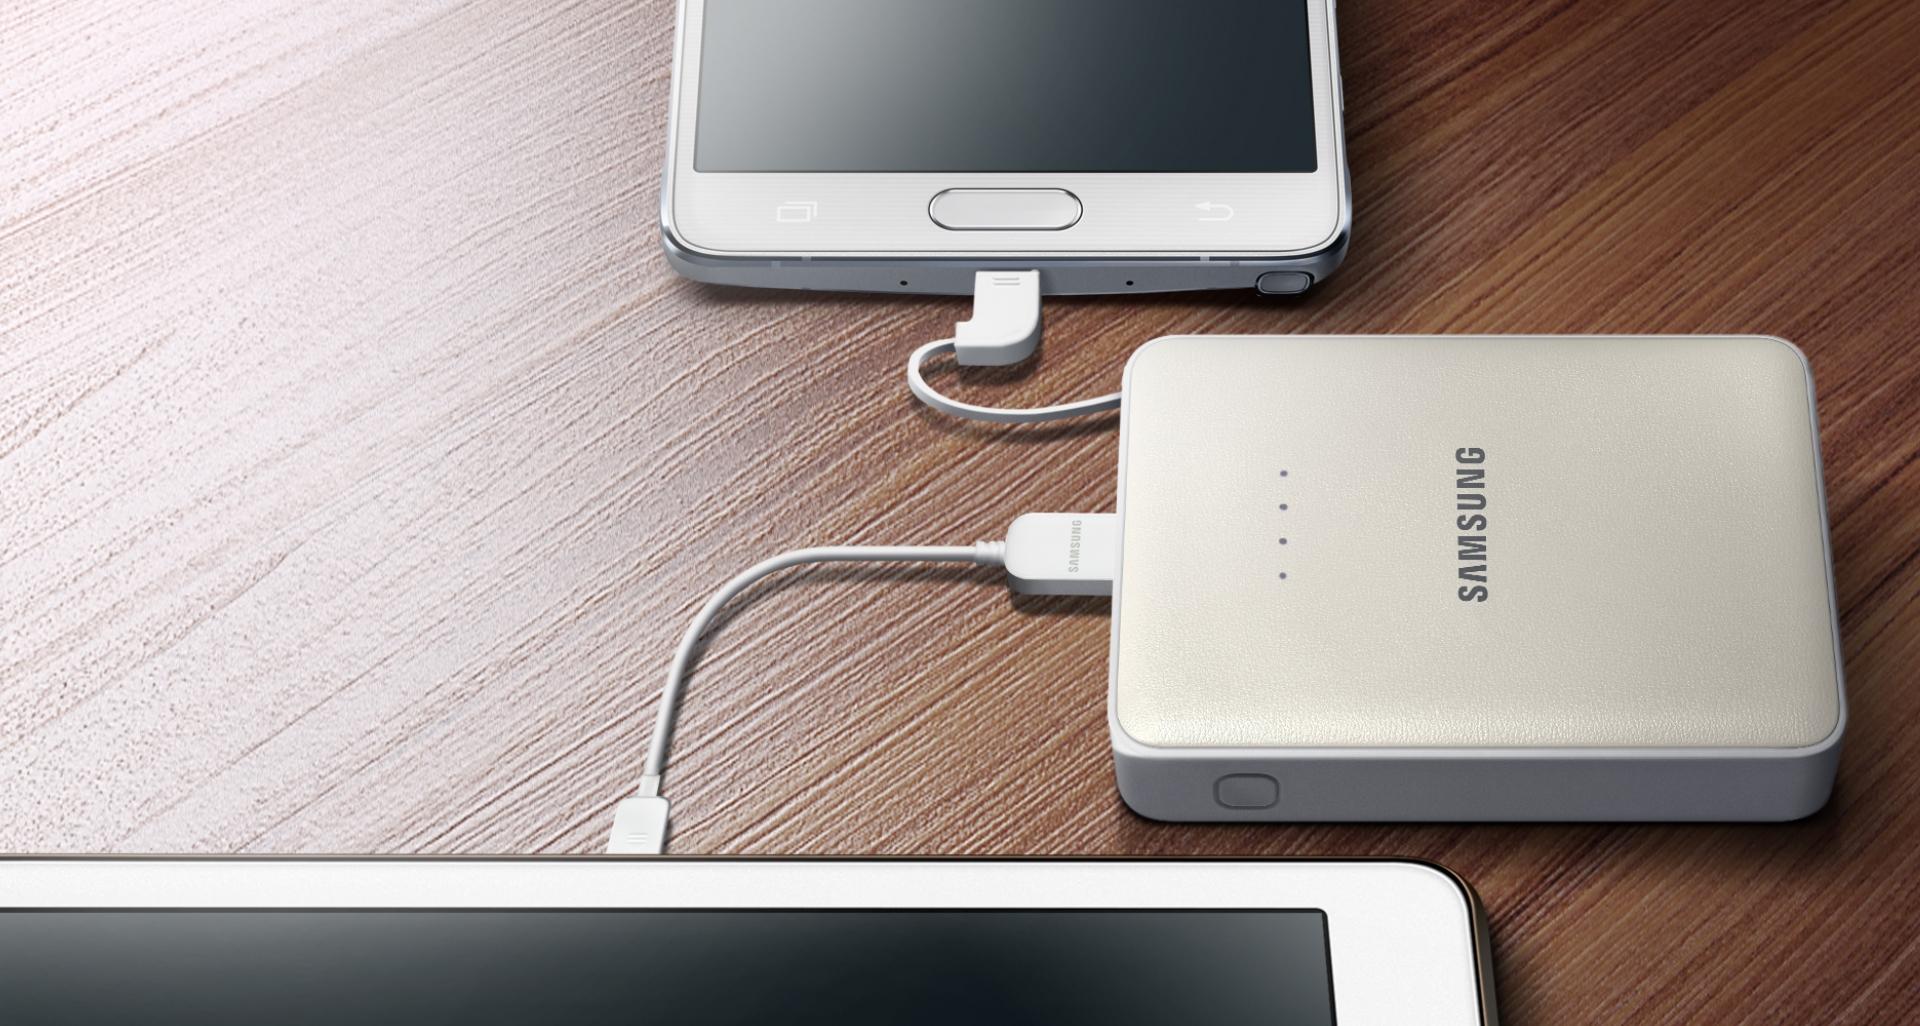 Acumulator universal extern cu incarcare rapida, Samsung EB-PG850 1